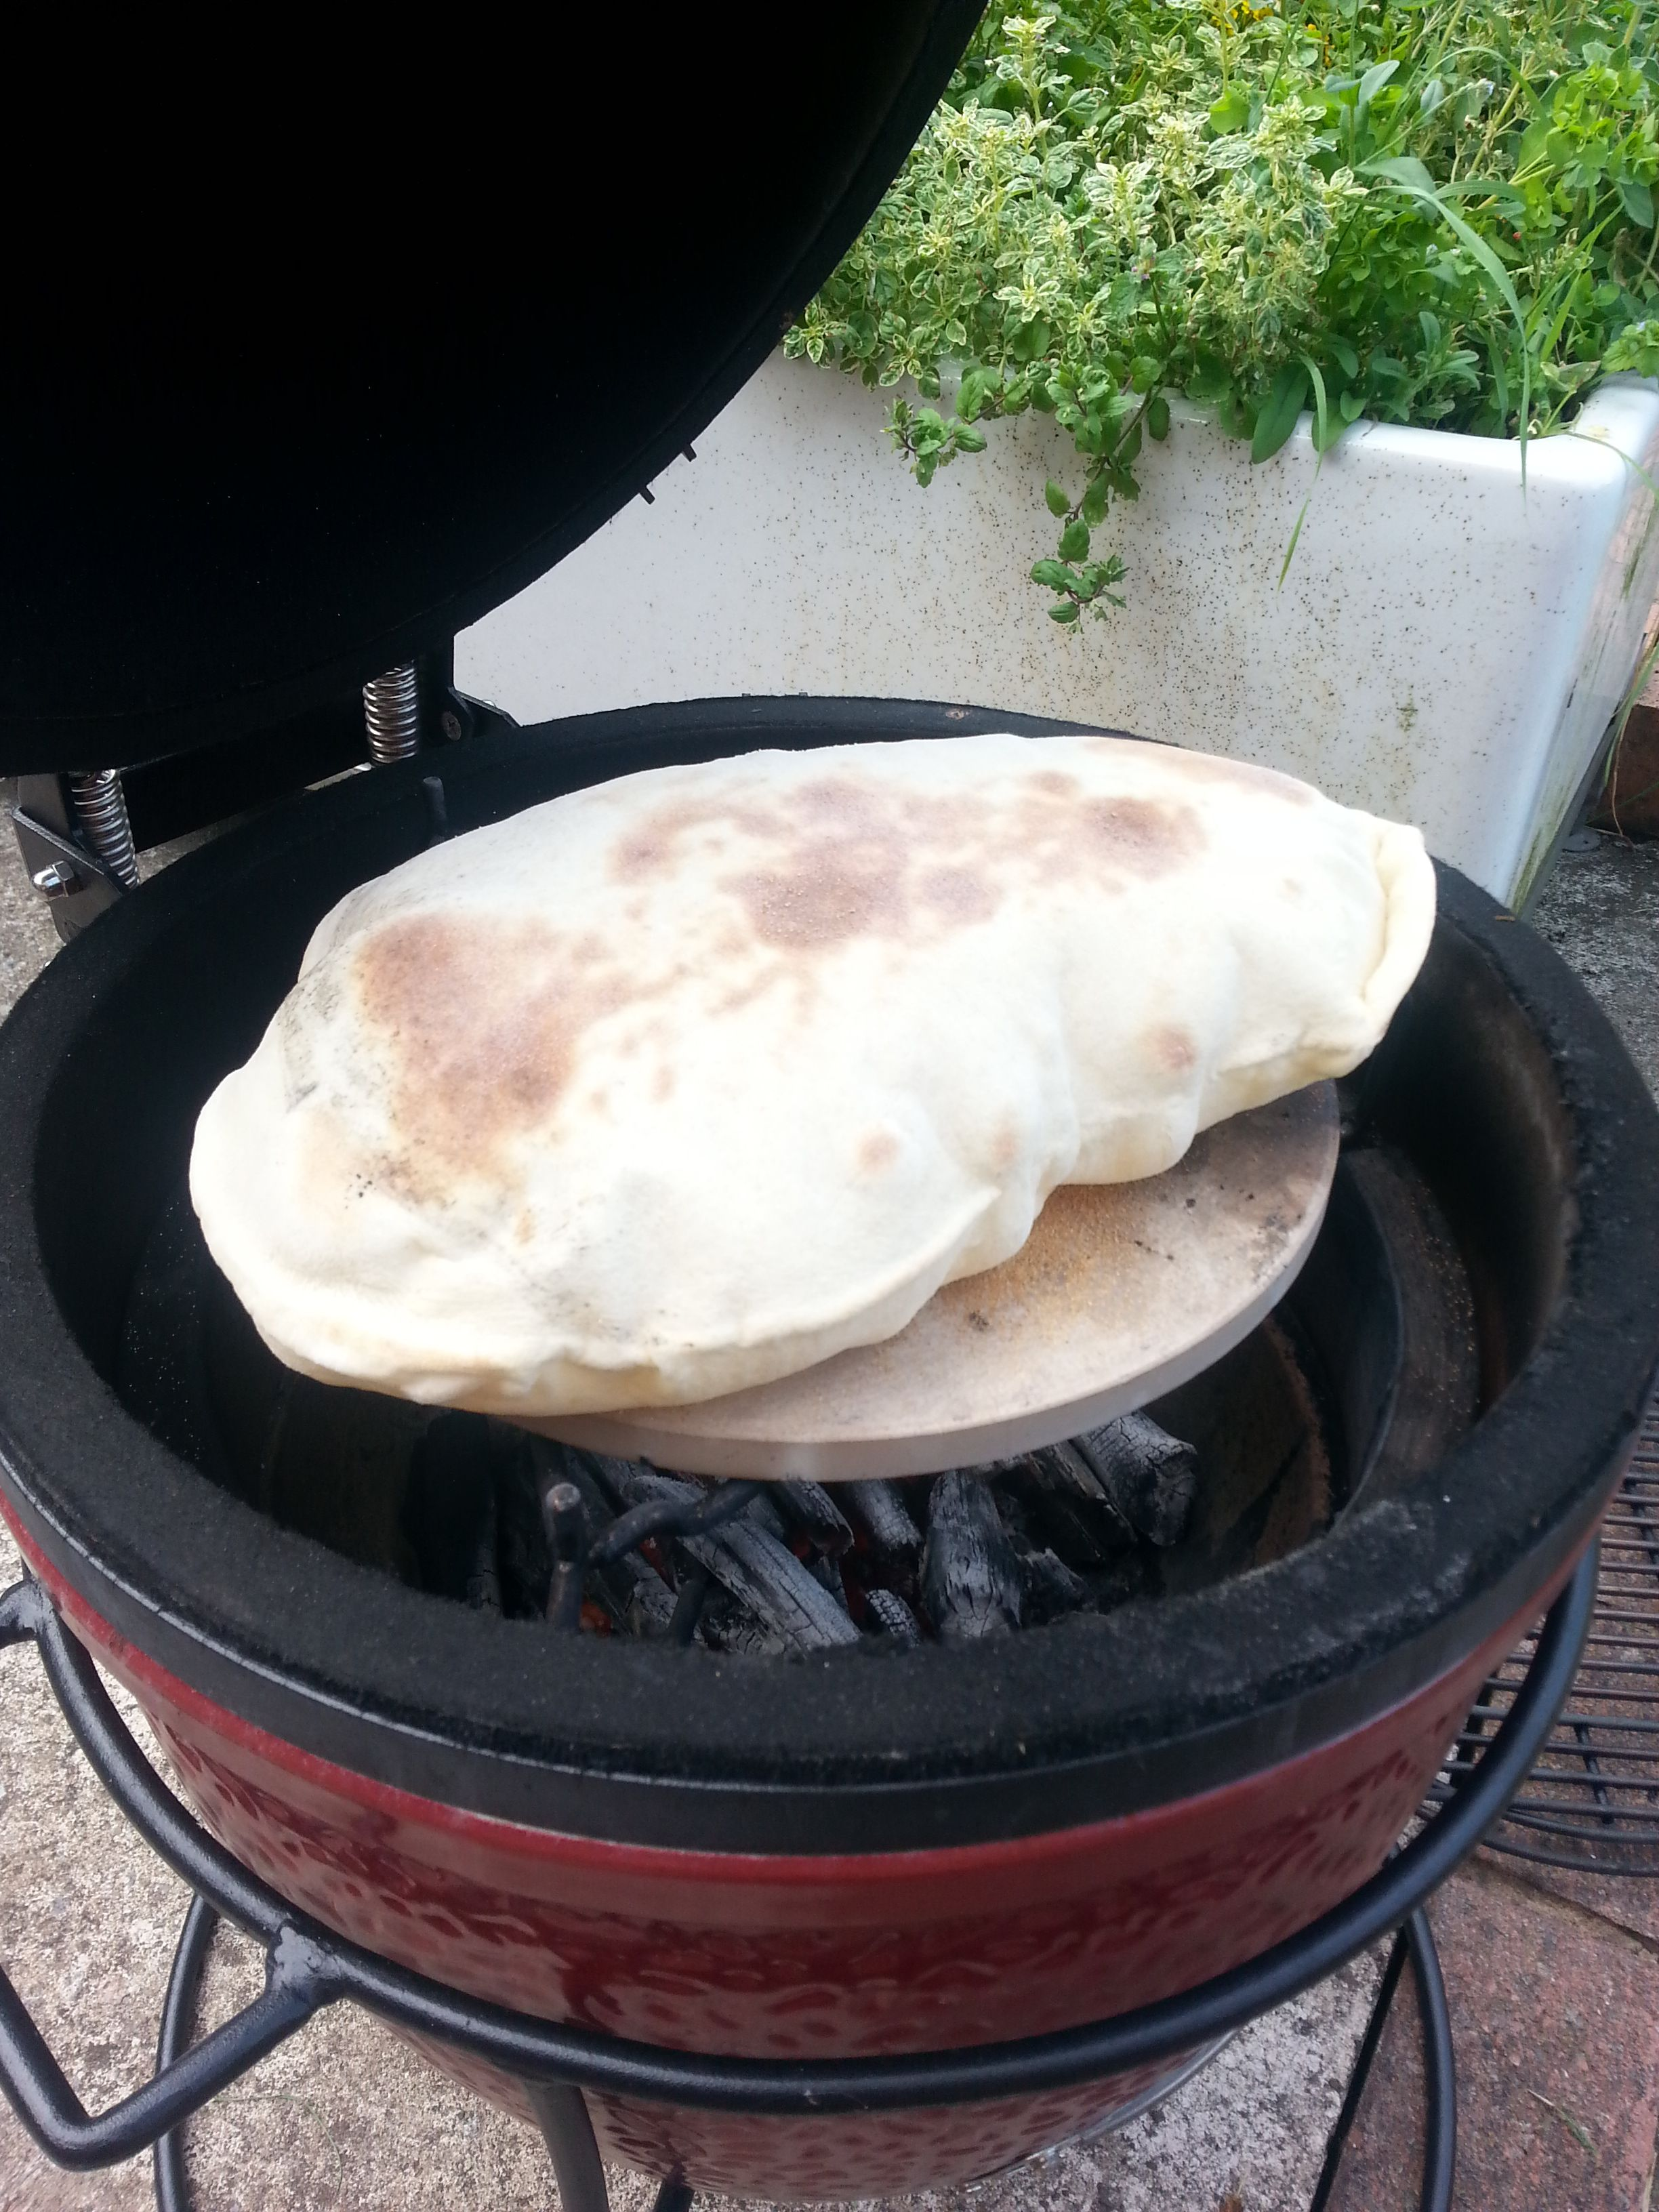 pitta breads cooked on the kamado joe